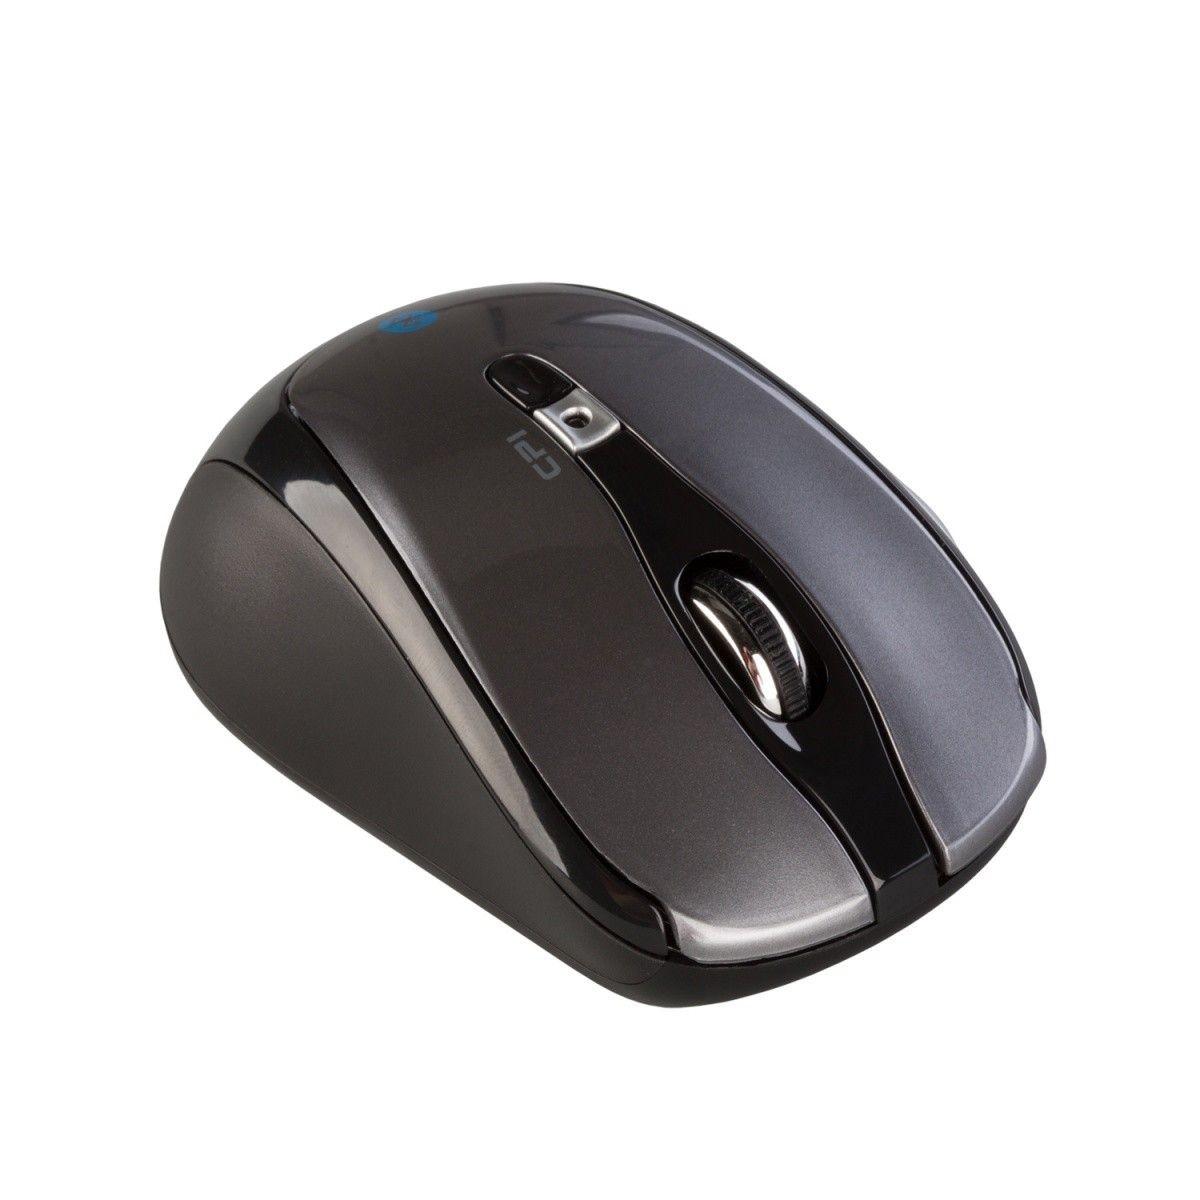 iTec i-tec Bluetouch 243 - Bluetooth optical mouse - Black 800/1200/1600 DPI